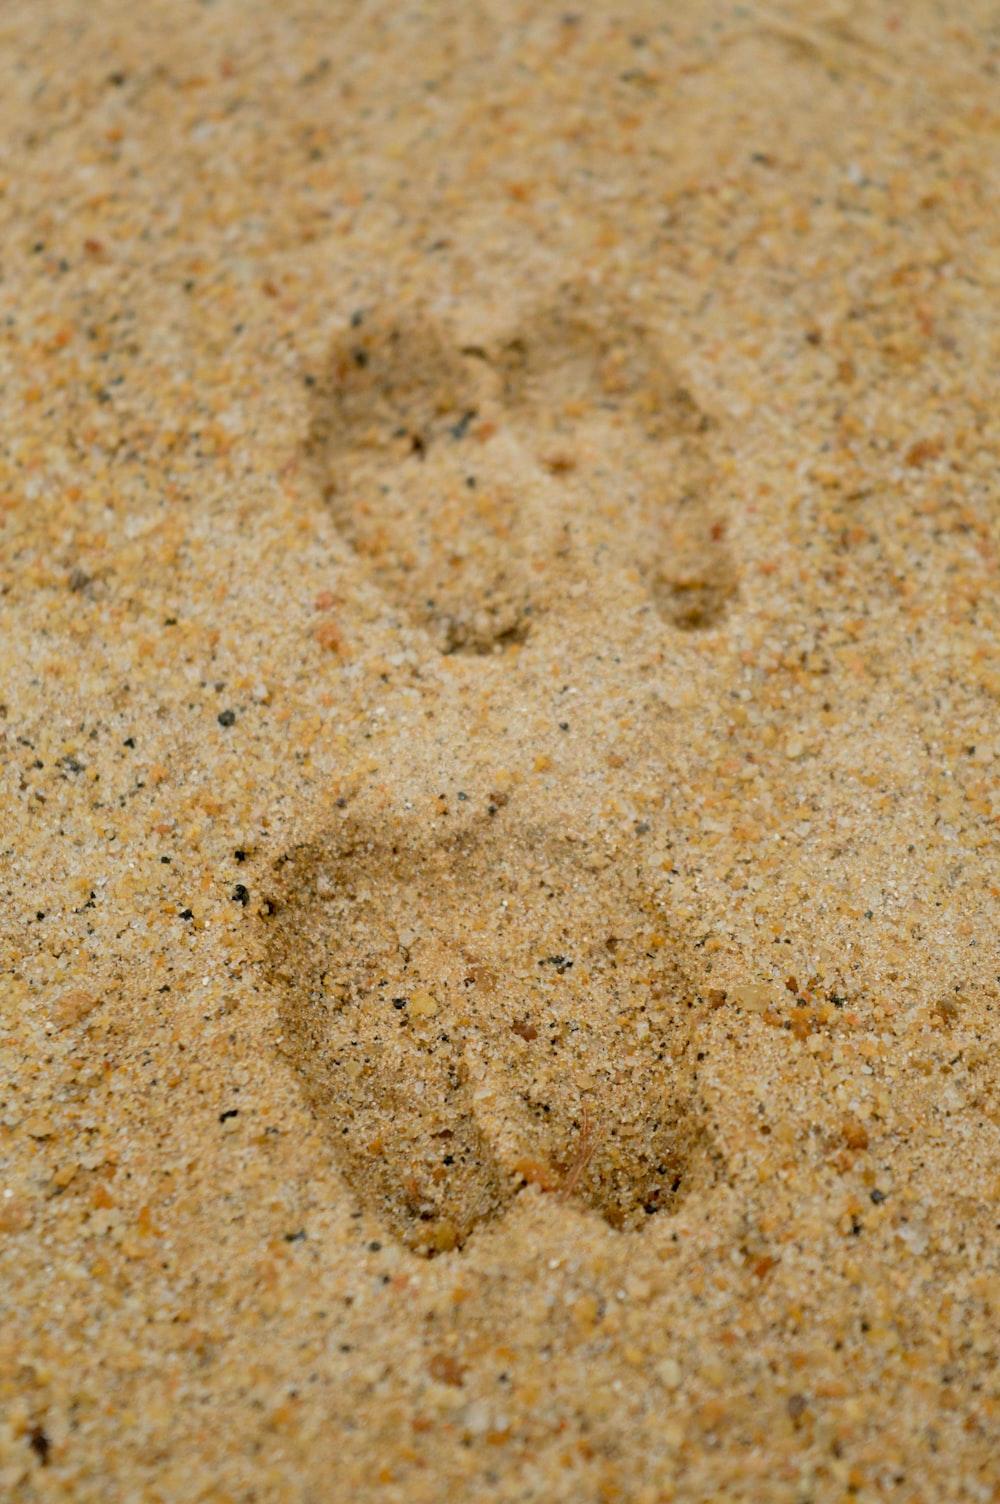 foot prints on sands